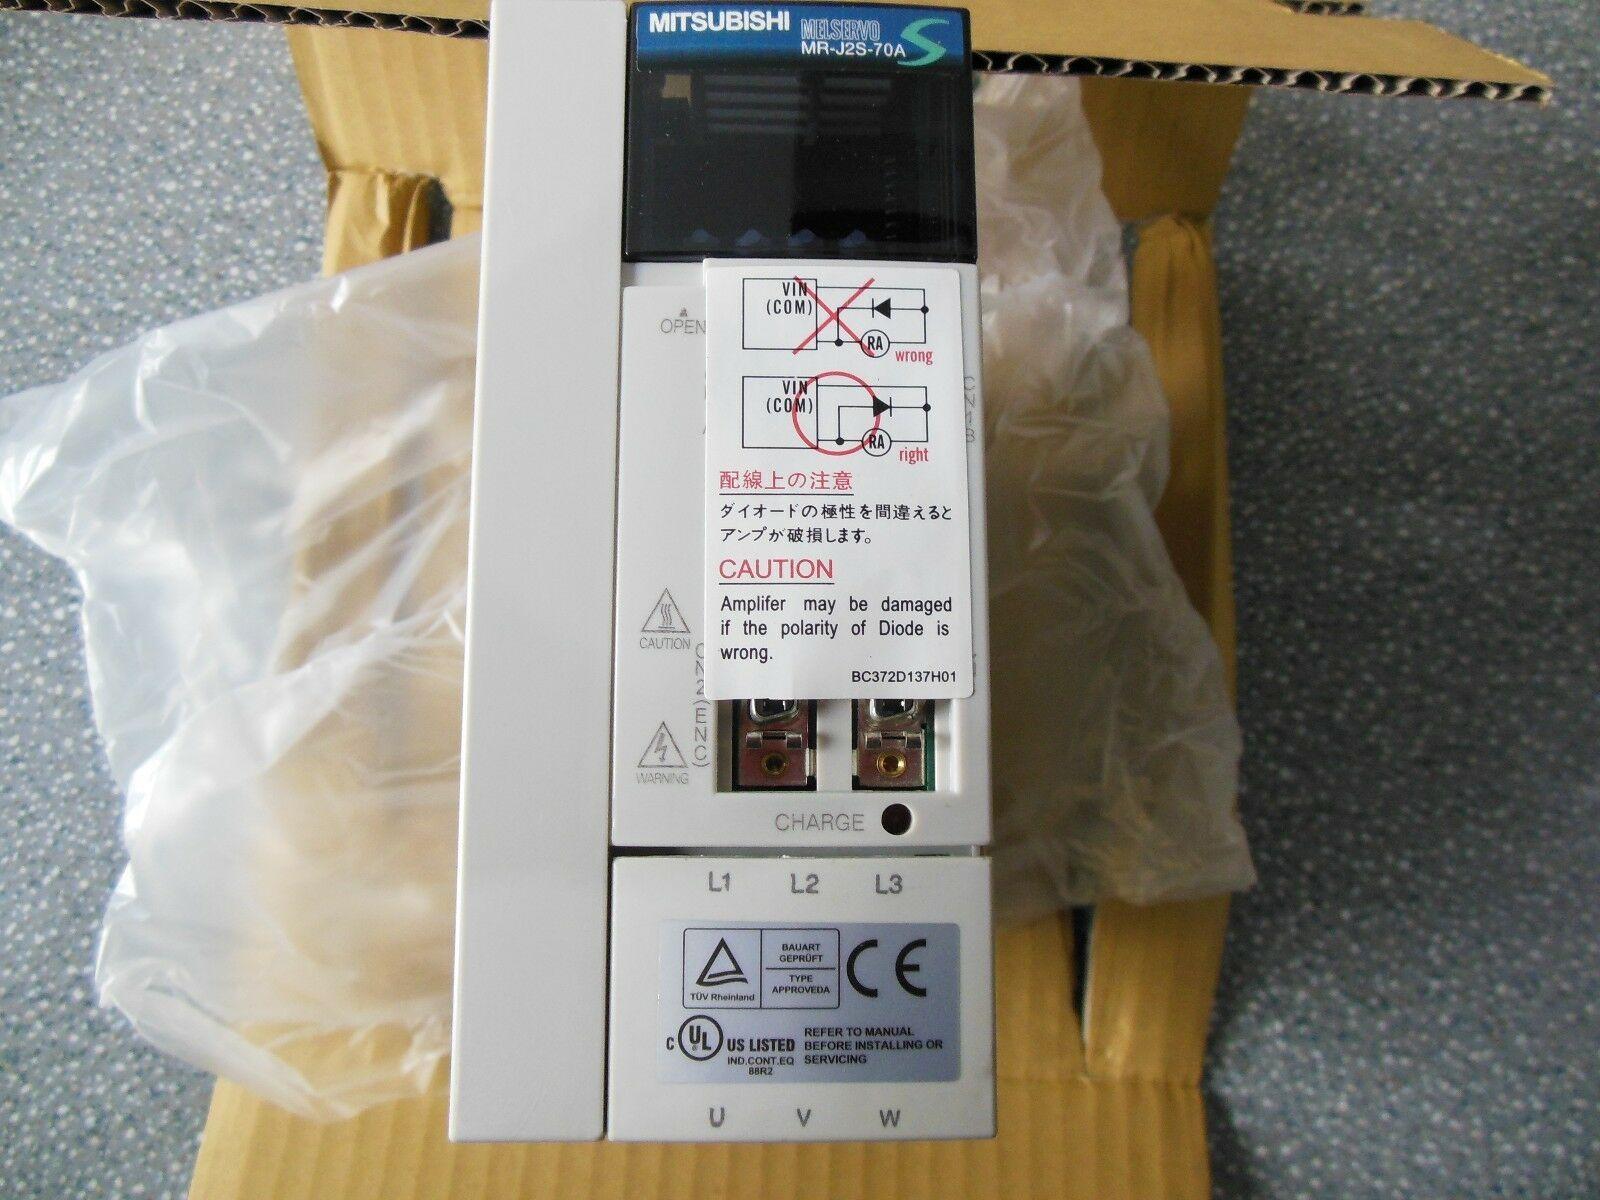 1PC Mitsubishi Servo Drive MR-J2S-70A MR-J2S-70B New In Box Free Expedited Shipping